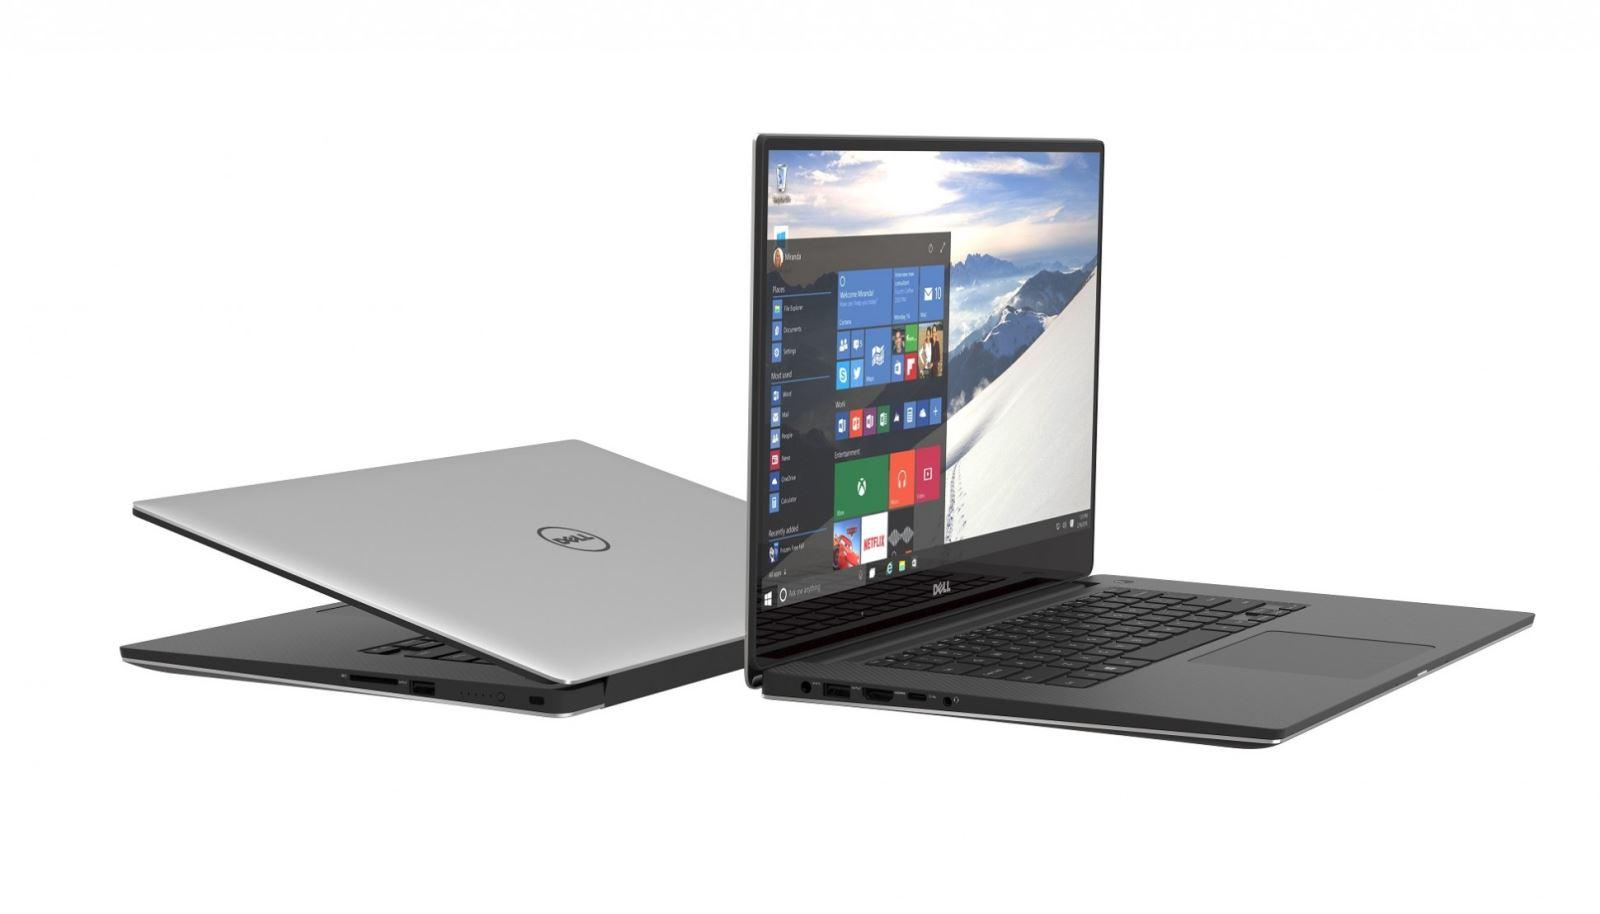 Goi-y-dap-an-cho-nghi-van-laptop-cu-o-dau-uy-tin2